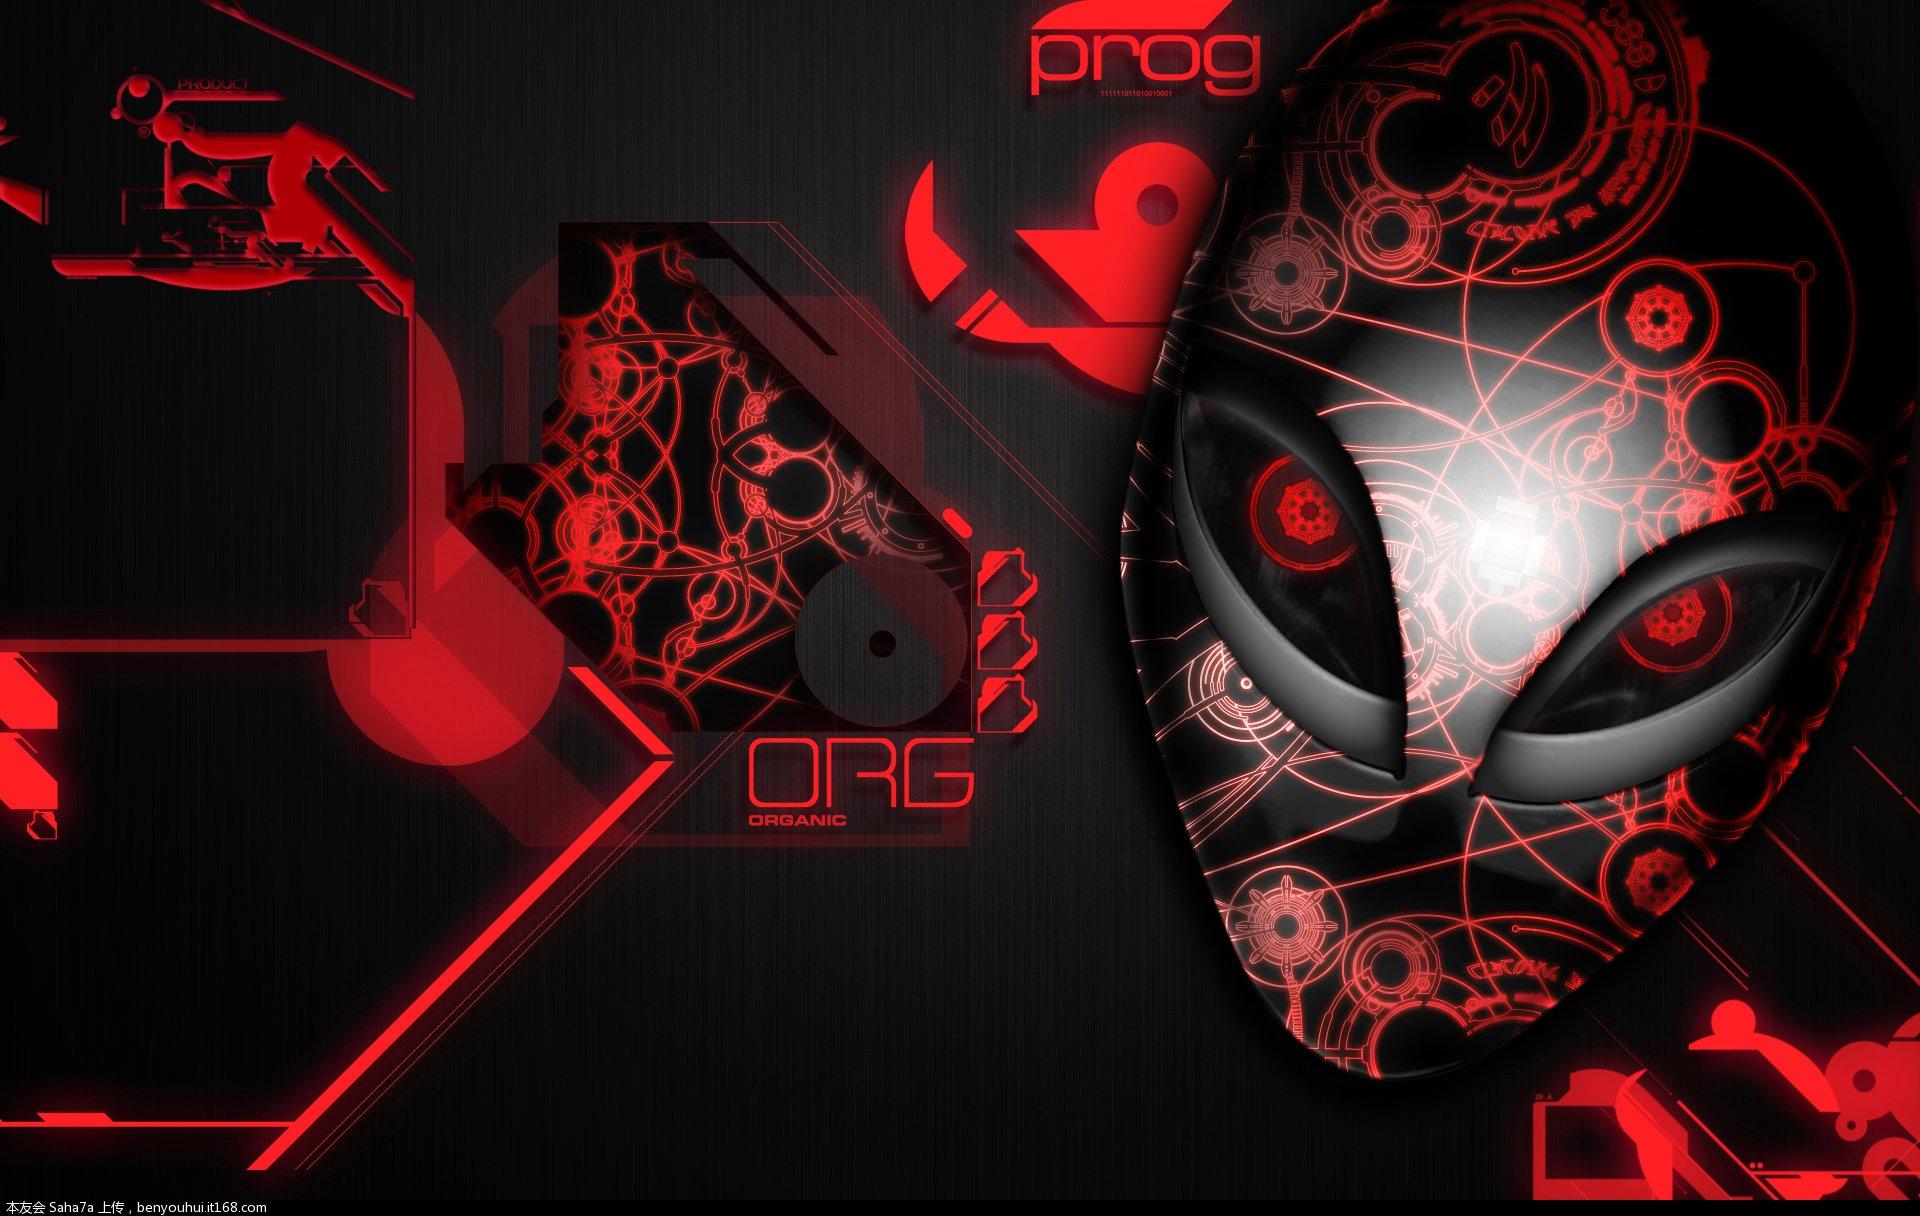 外星人论坛 69 alienware - 高清壁纸 & alienware 泡泡屏保